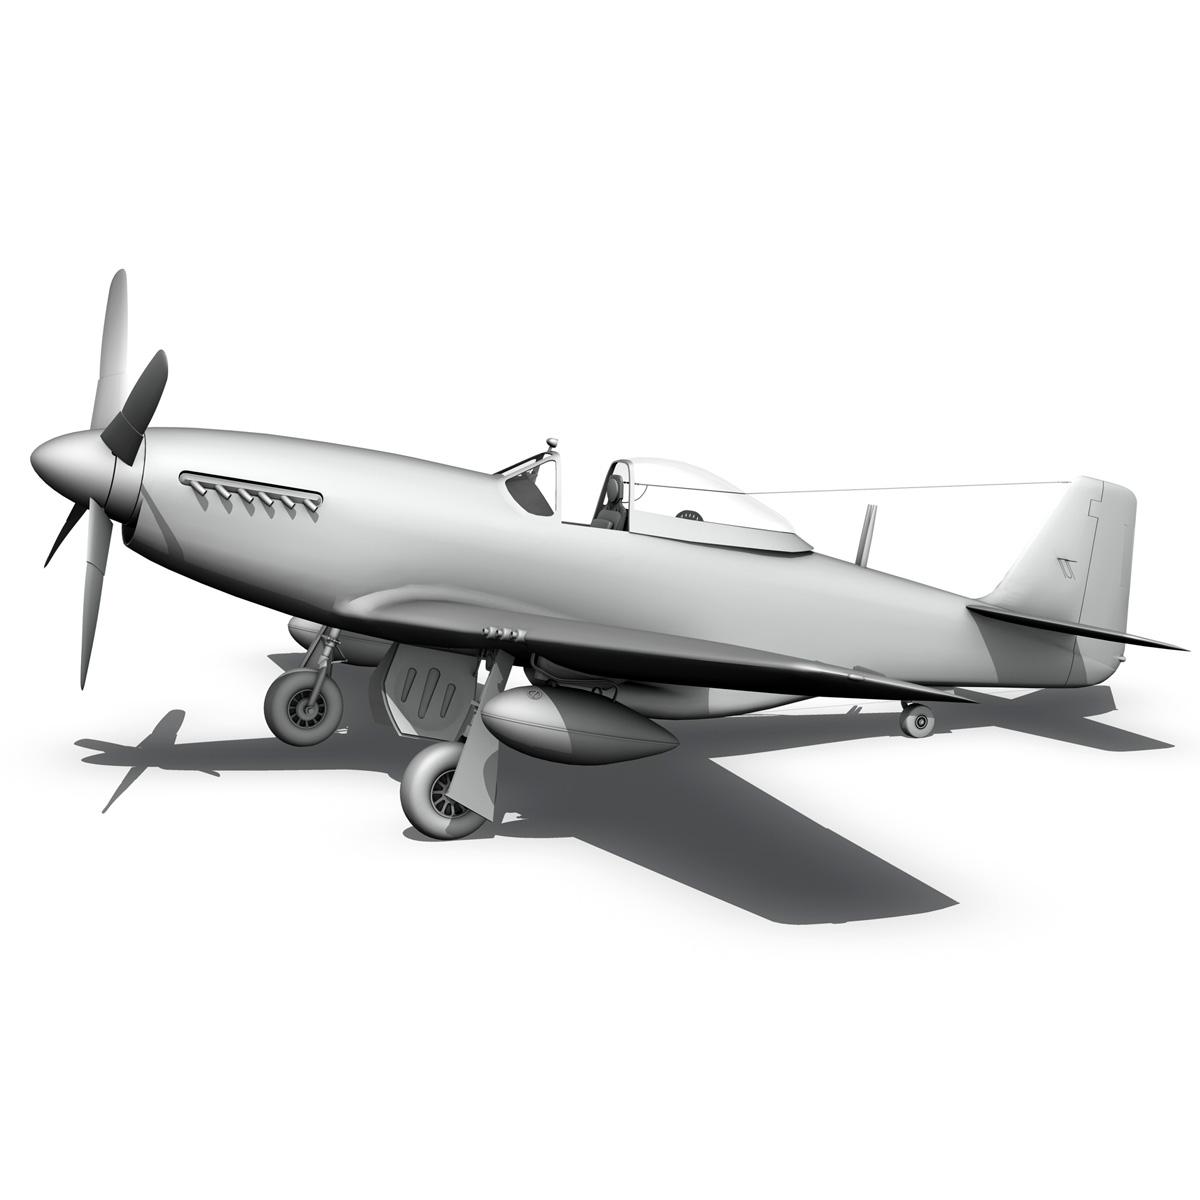 north american p-51d mustang – cathy beloved 3d model fbx lwo lw lws obj c4d 266547